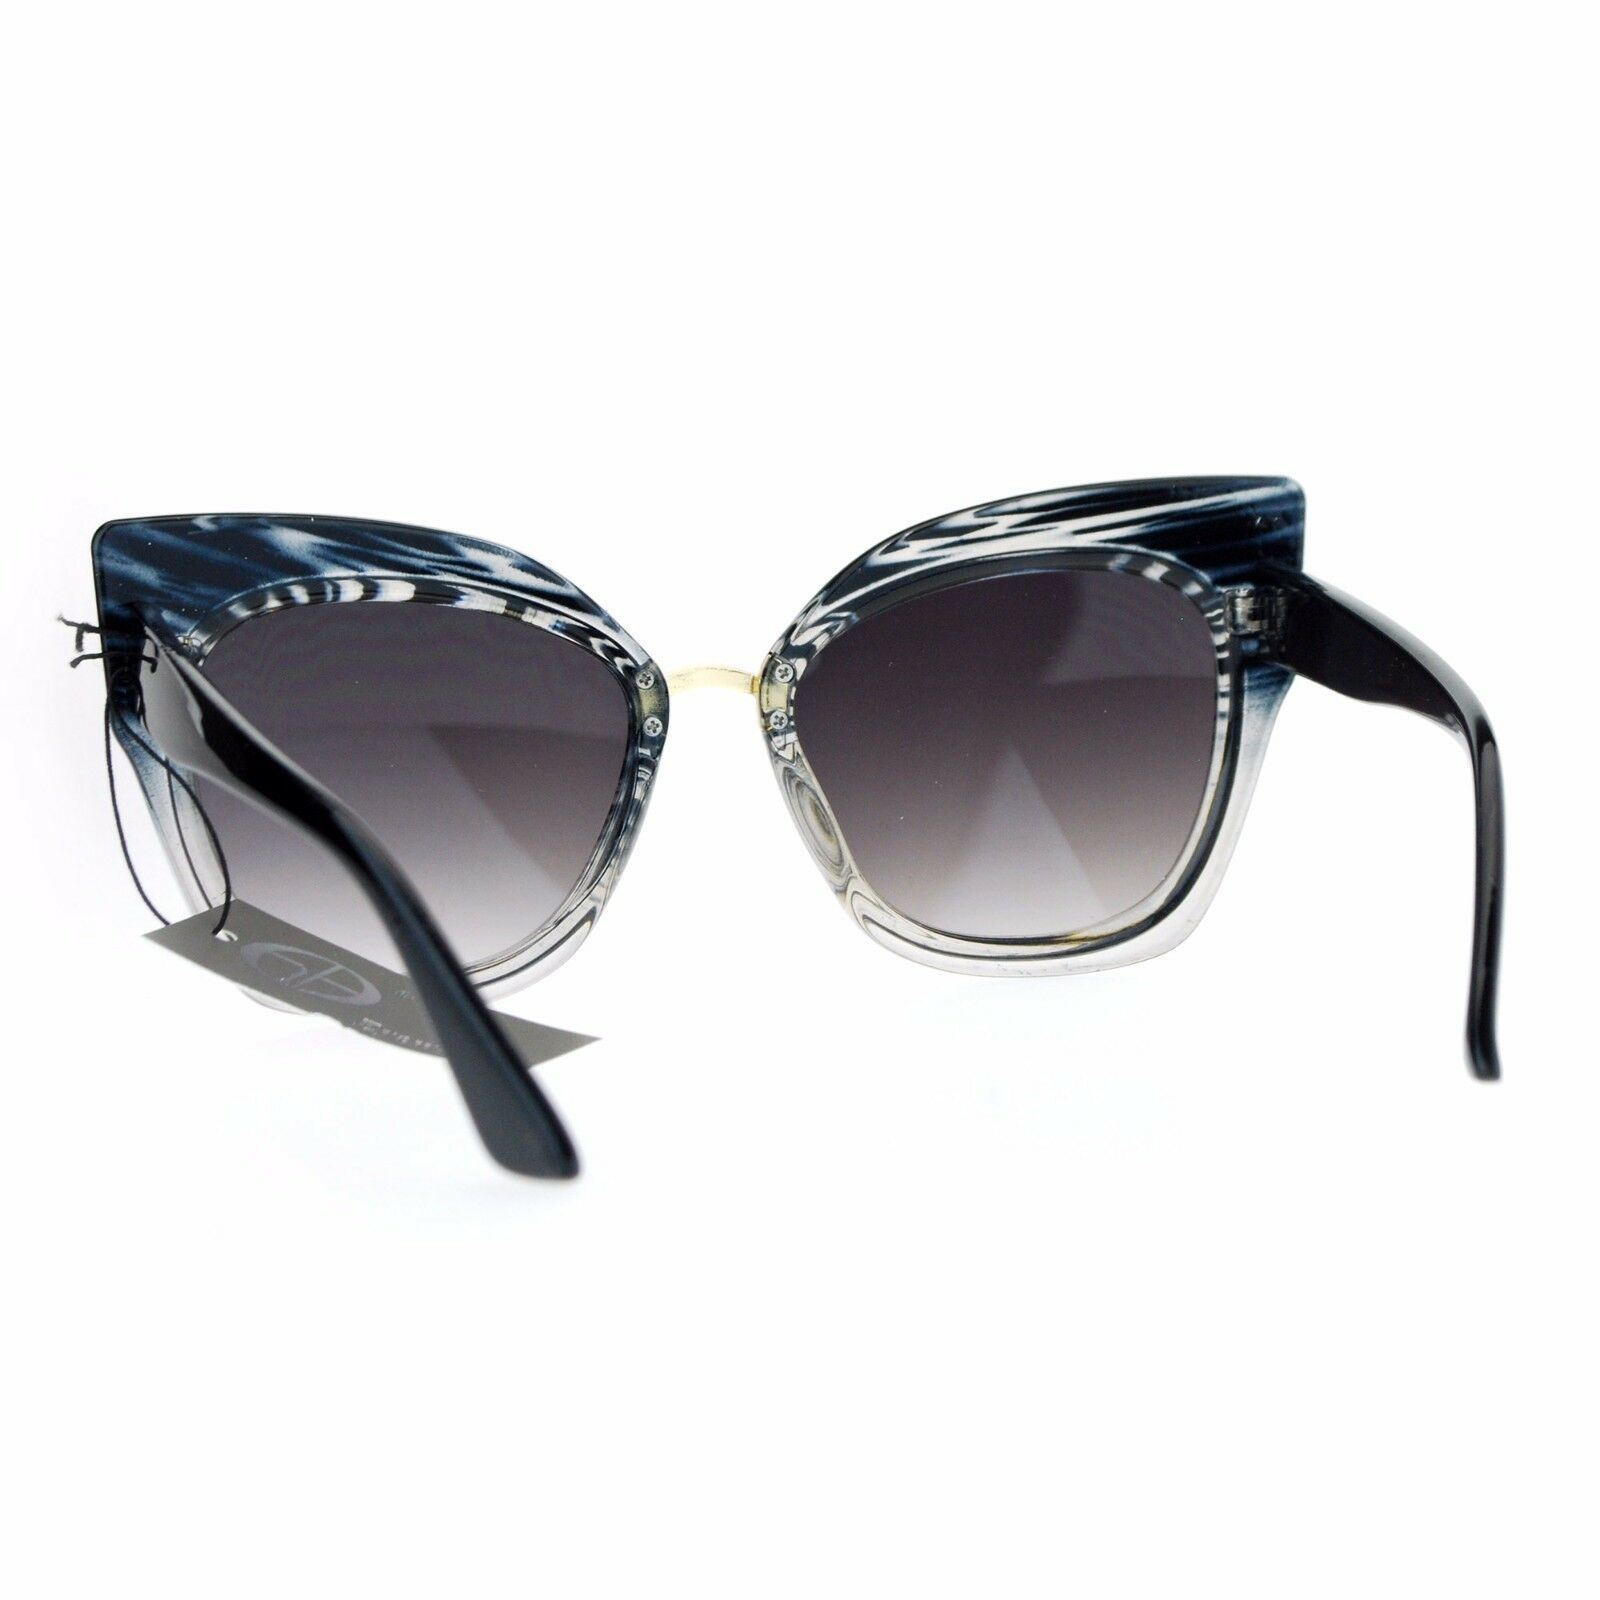 Oversized Fashion Sunglasses Womens Square Cateye Butterfly UV 400 image 11